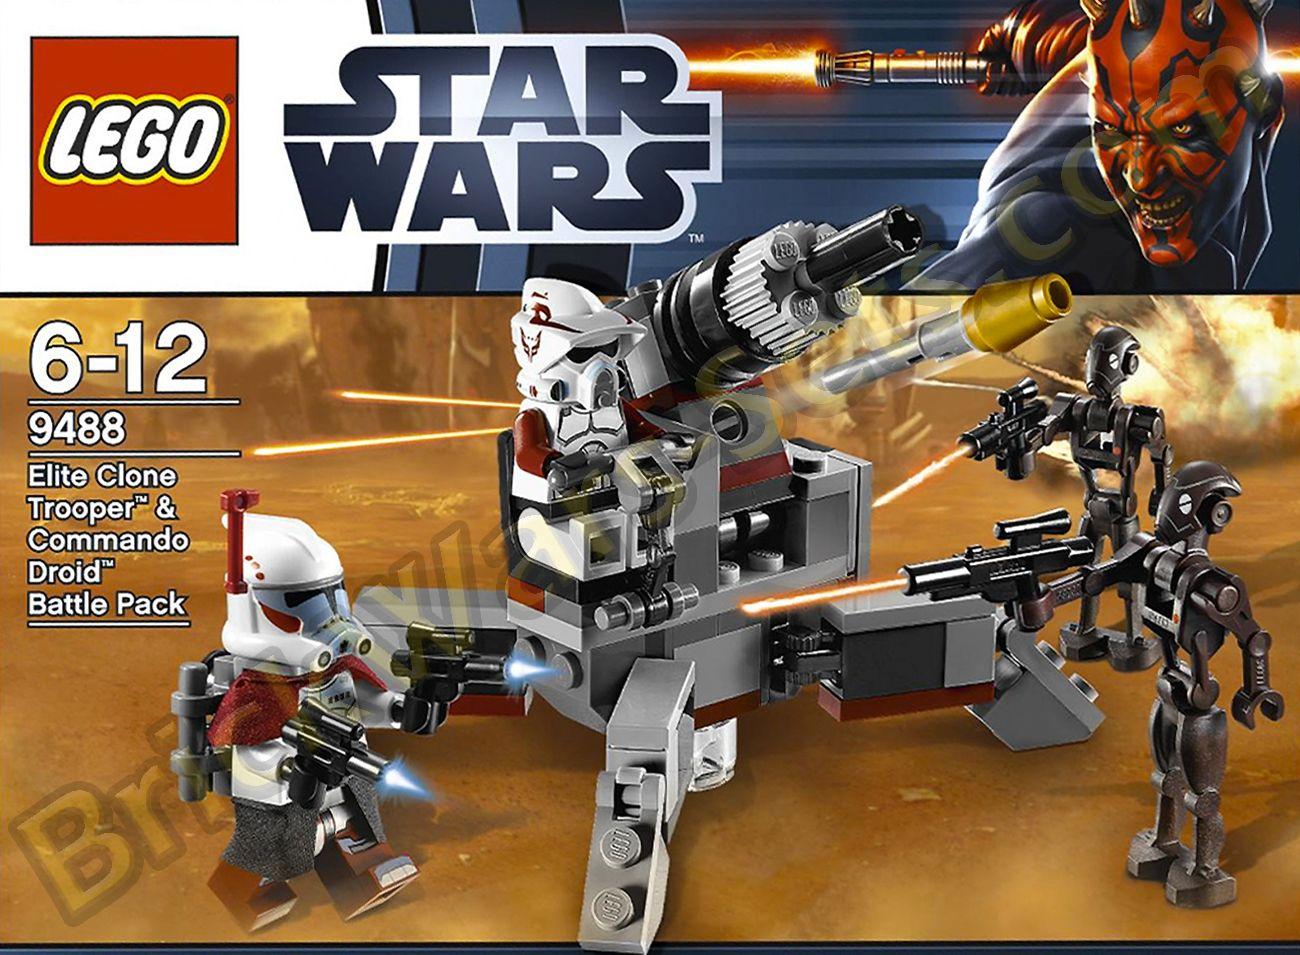 Lego Star Wars 9488 Elite Clone Trooper Battle Pack Instructions Only